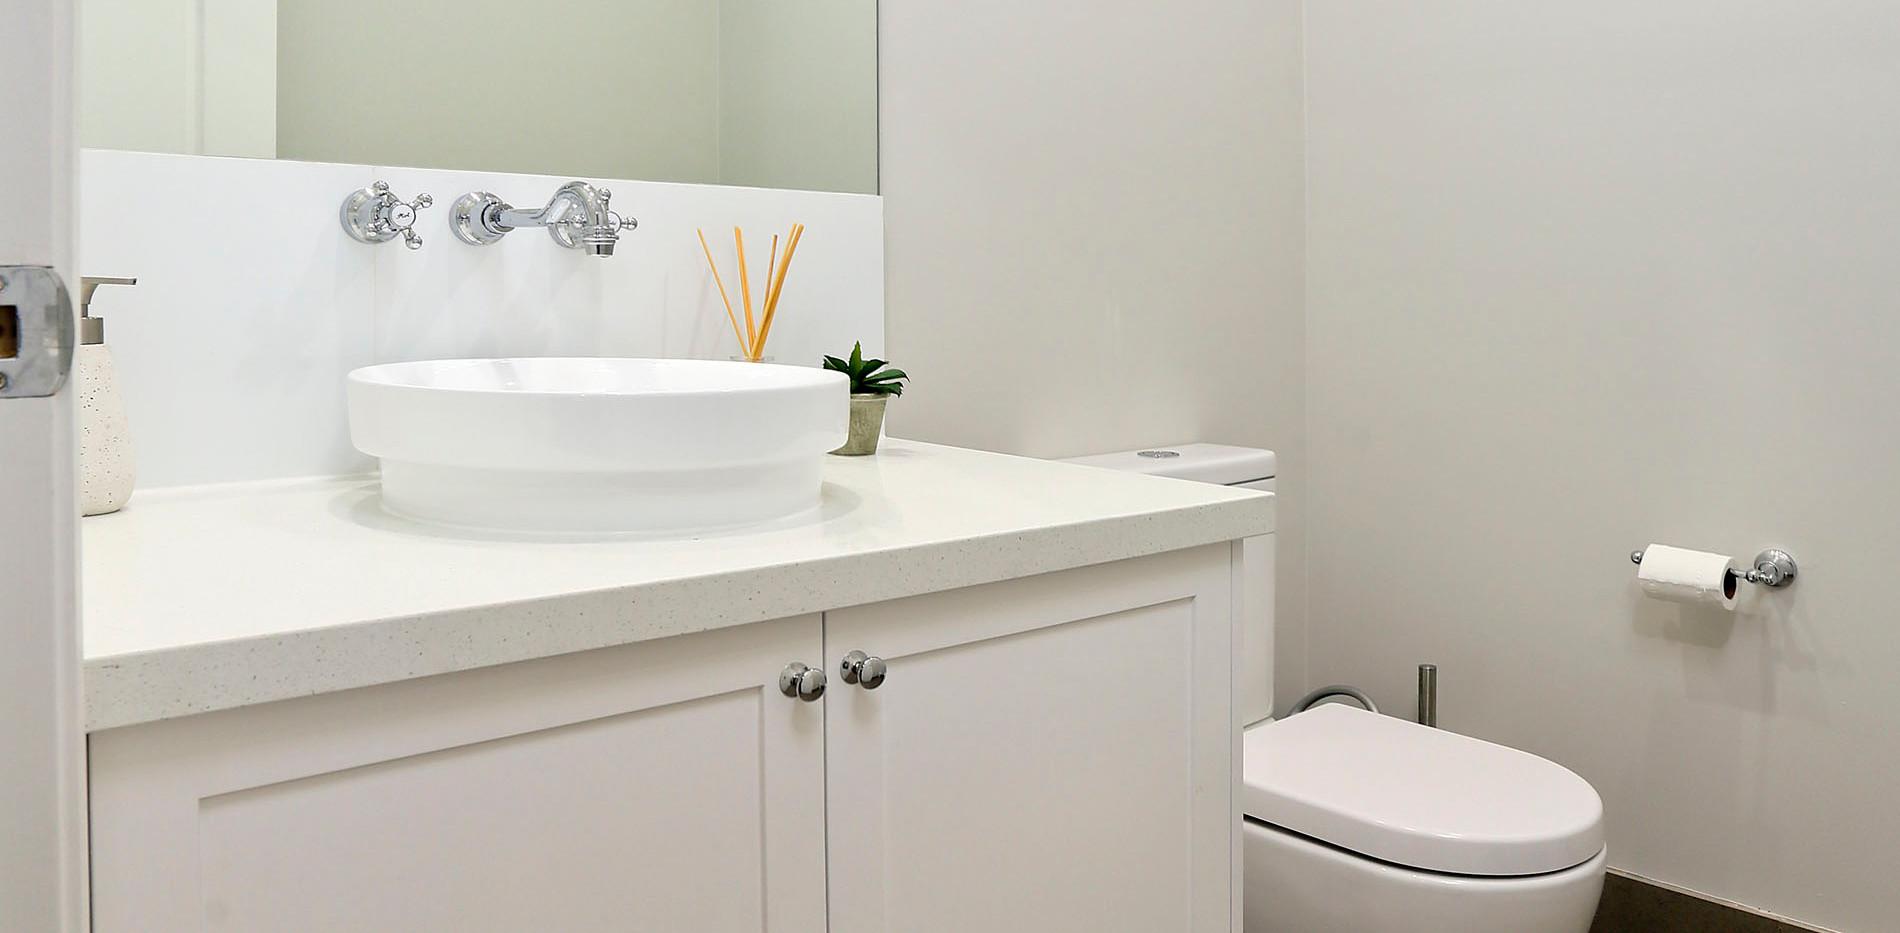 Small Bathrooms-Powder Rooms (11)